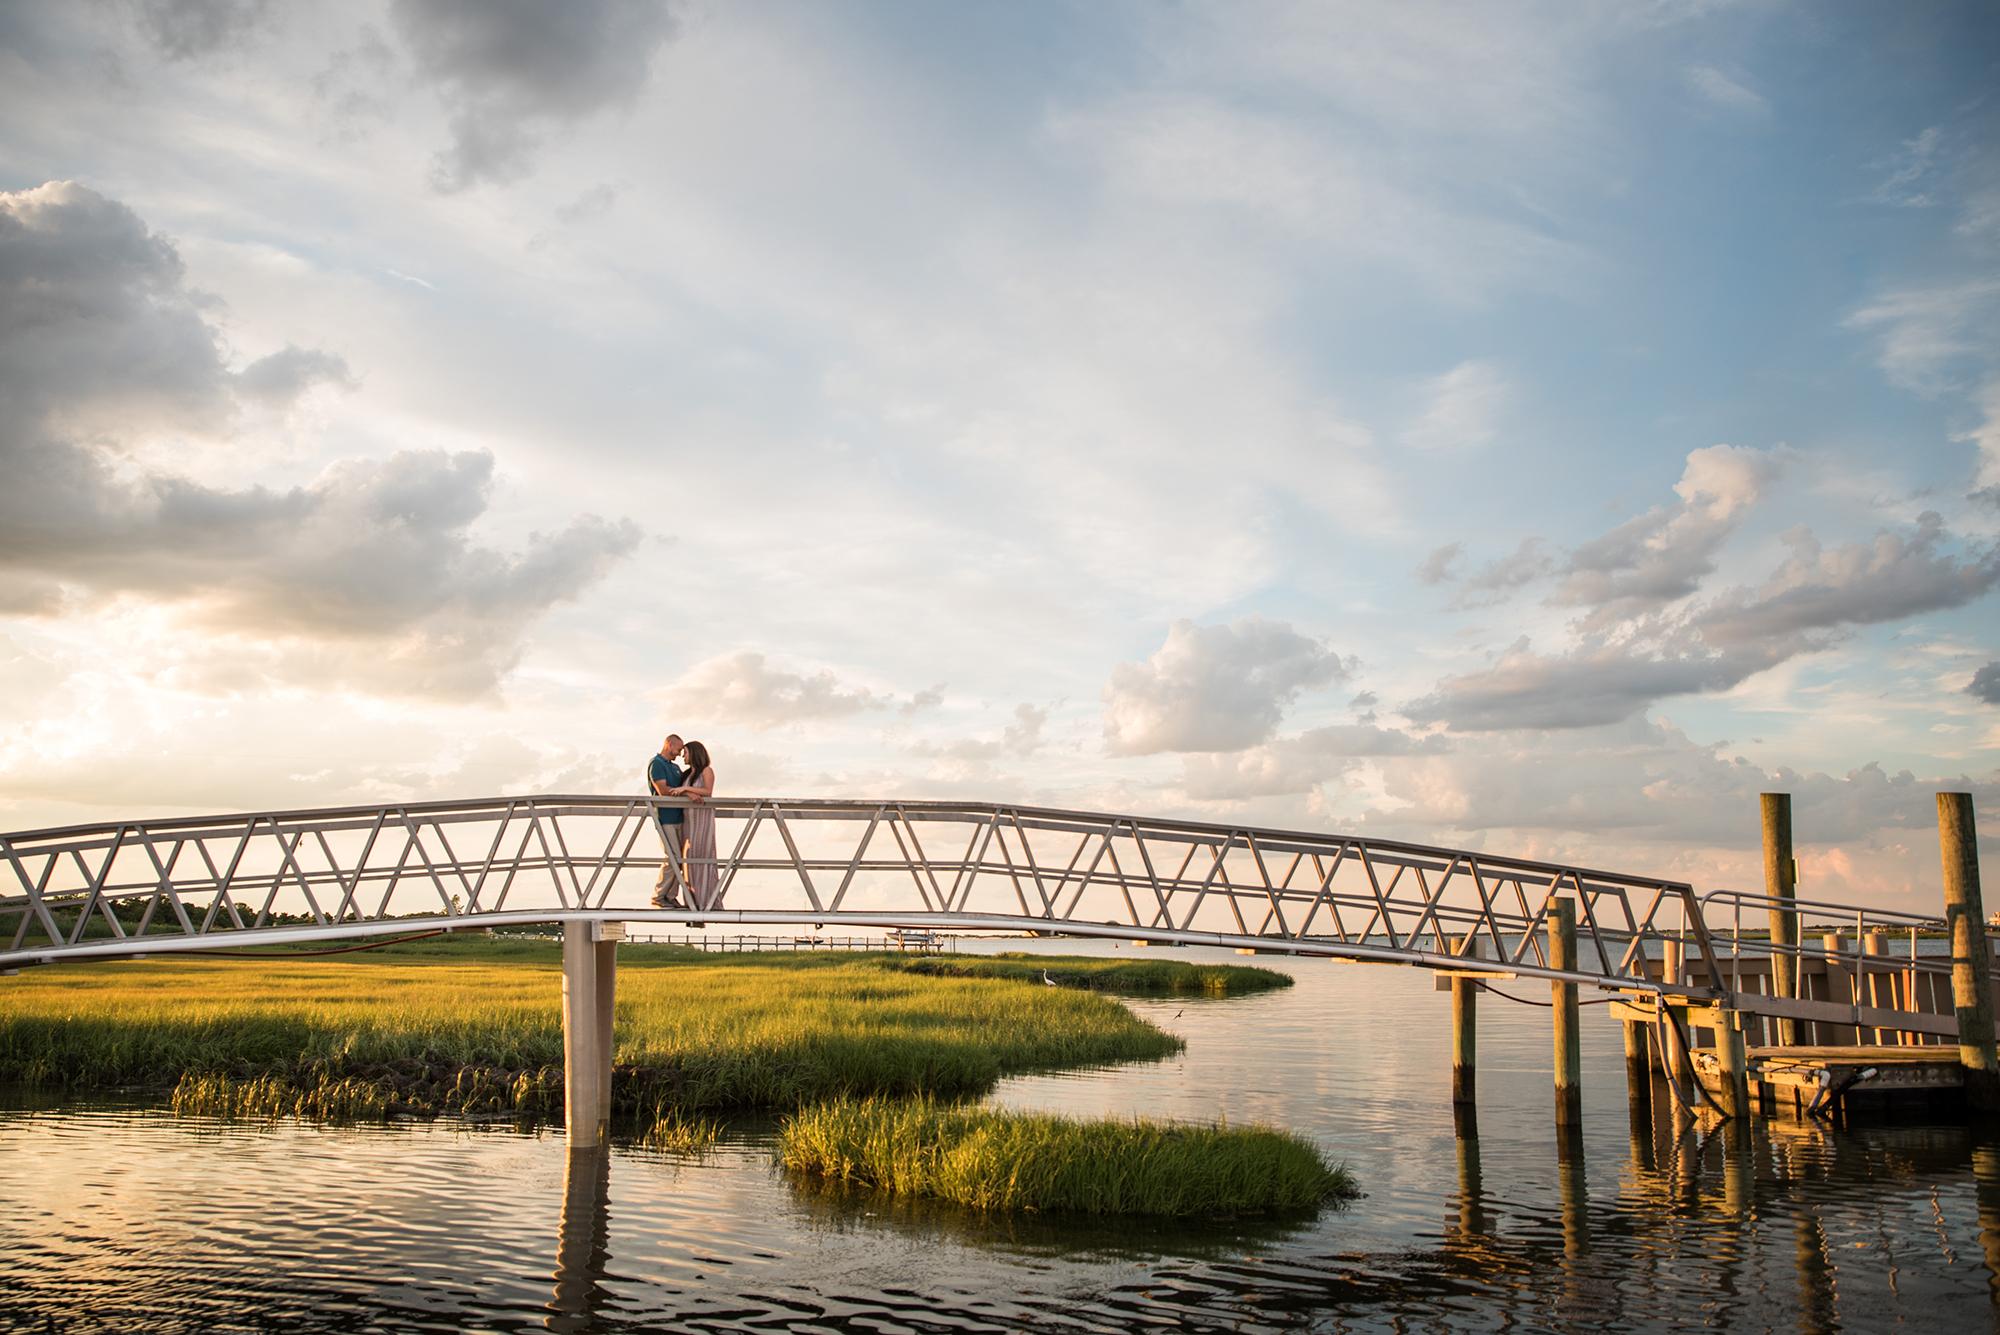 lbi-engagement-photographer-val-lance-on-bridge